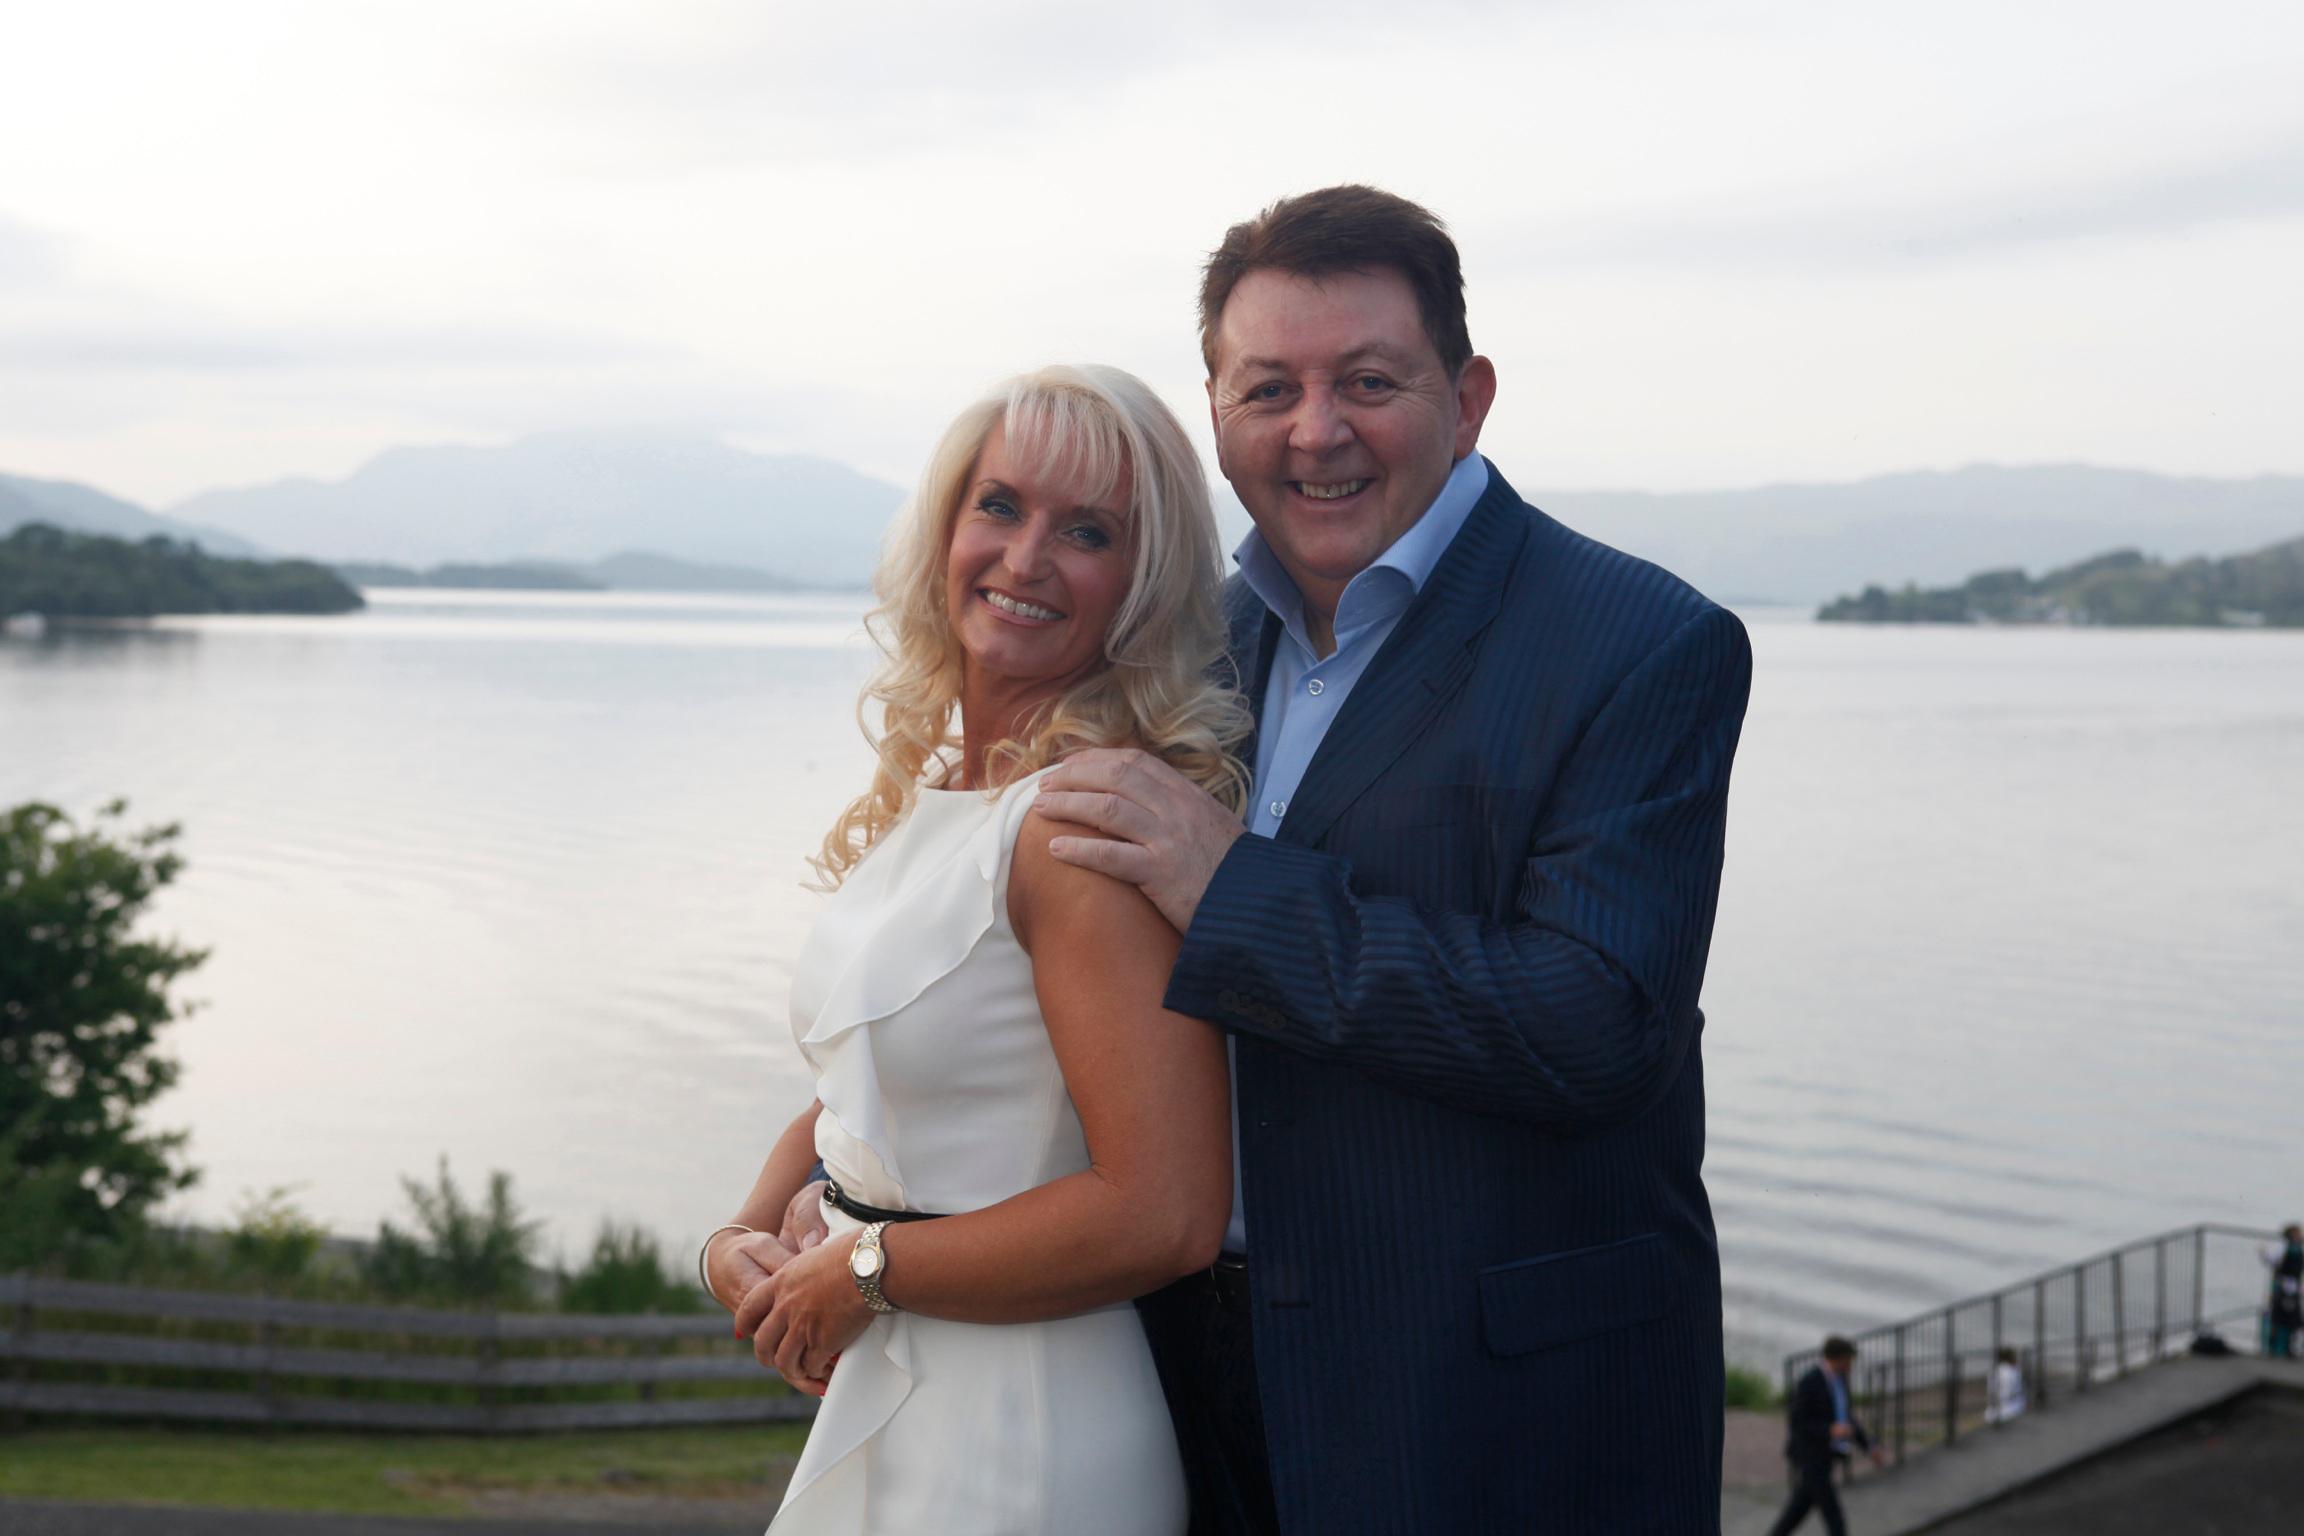 Dean Park and his new bride Karen